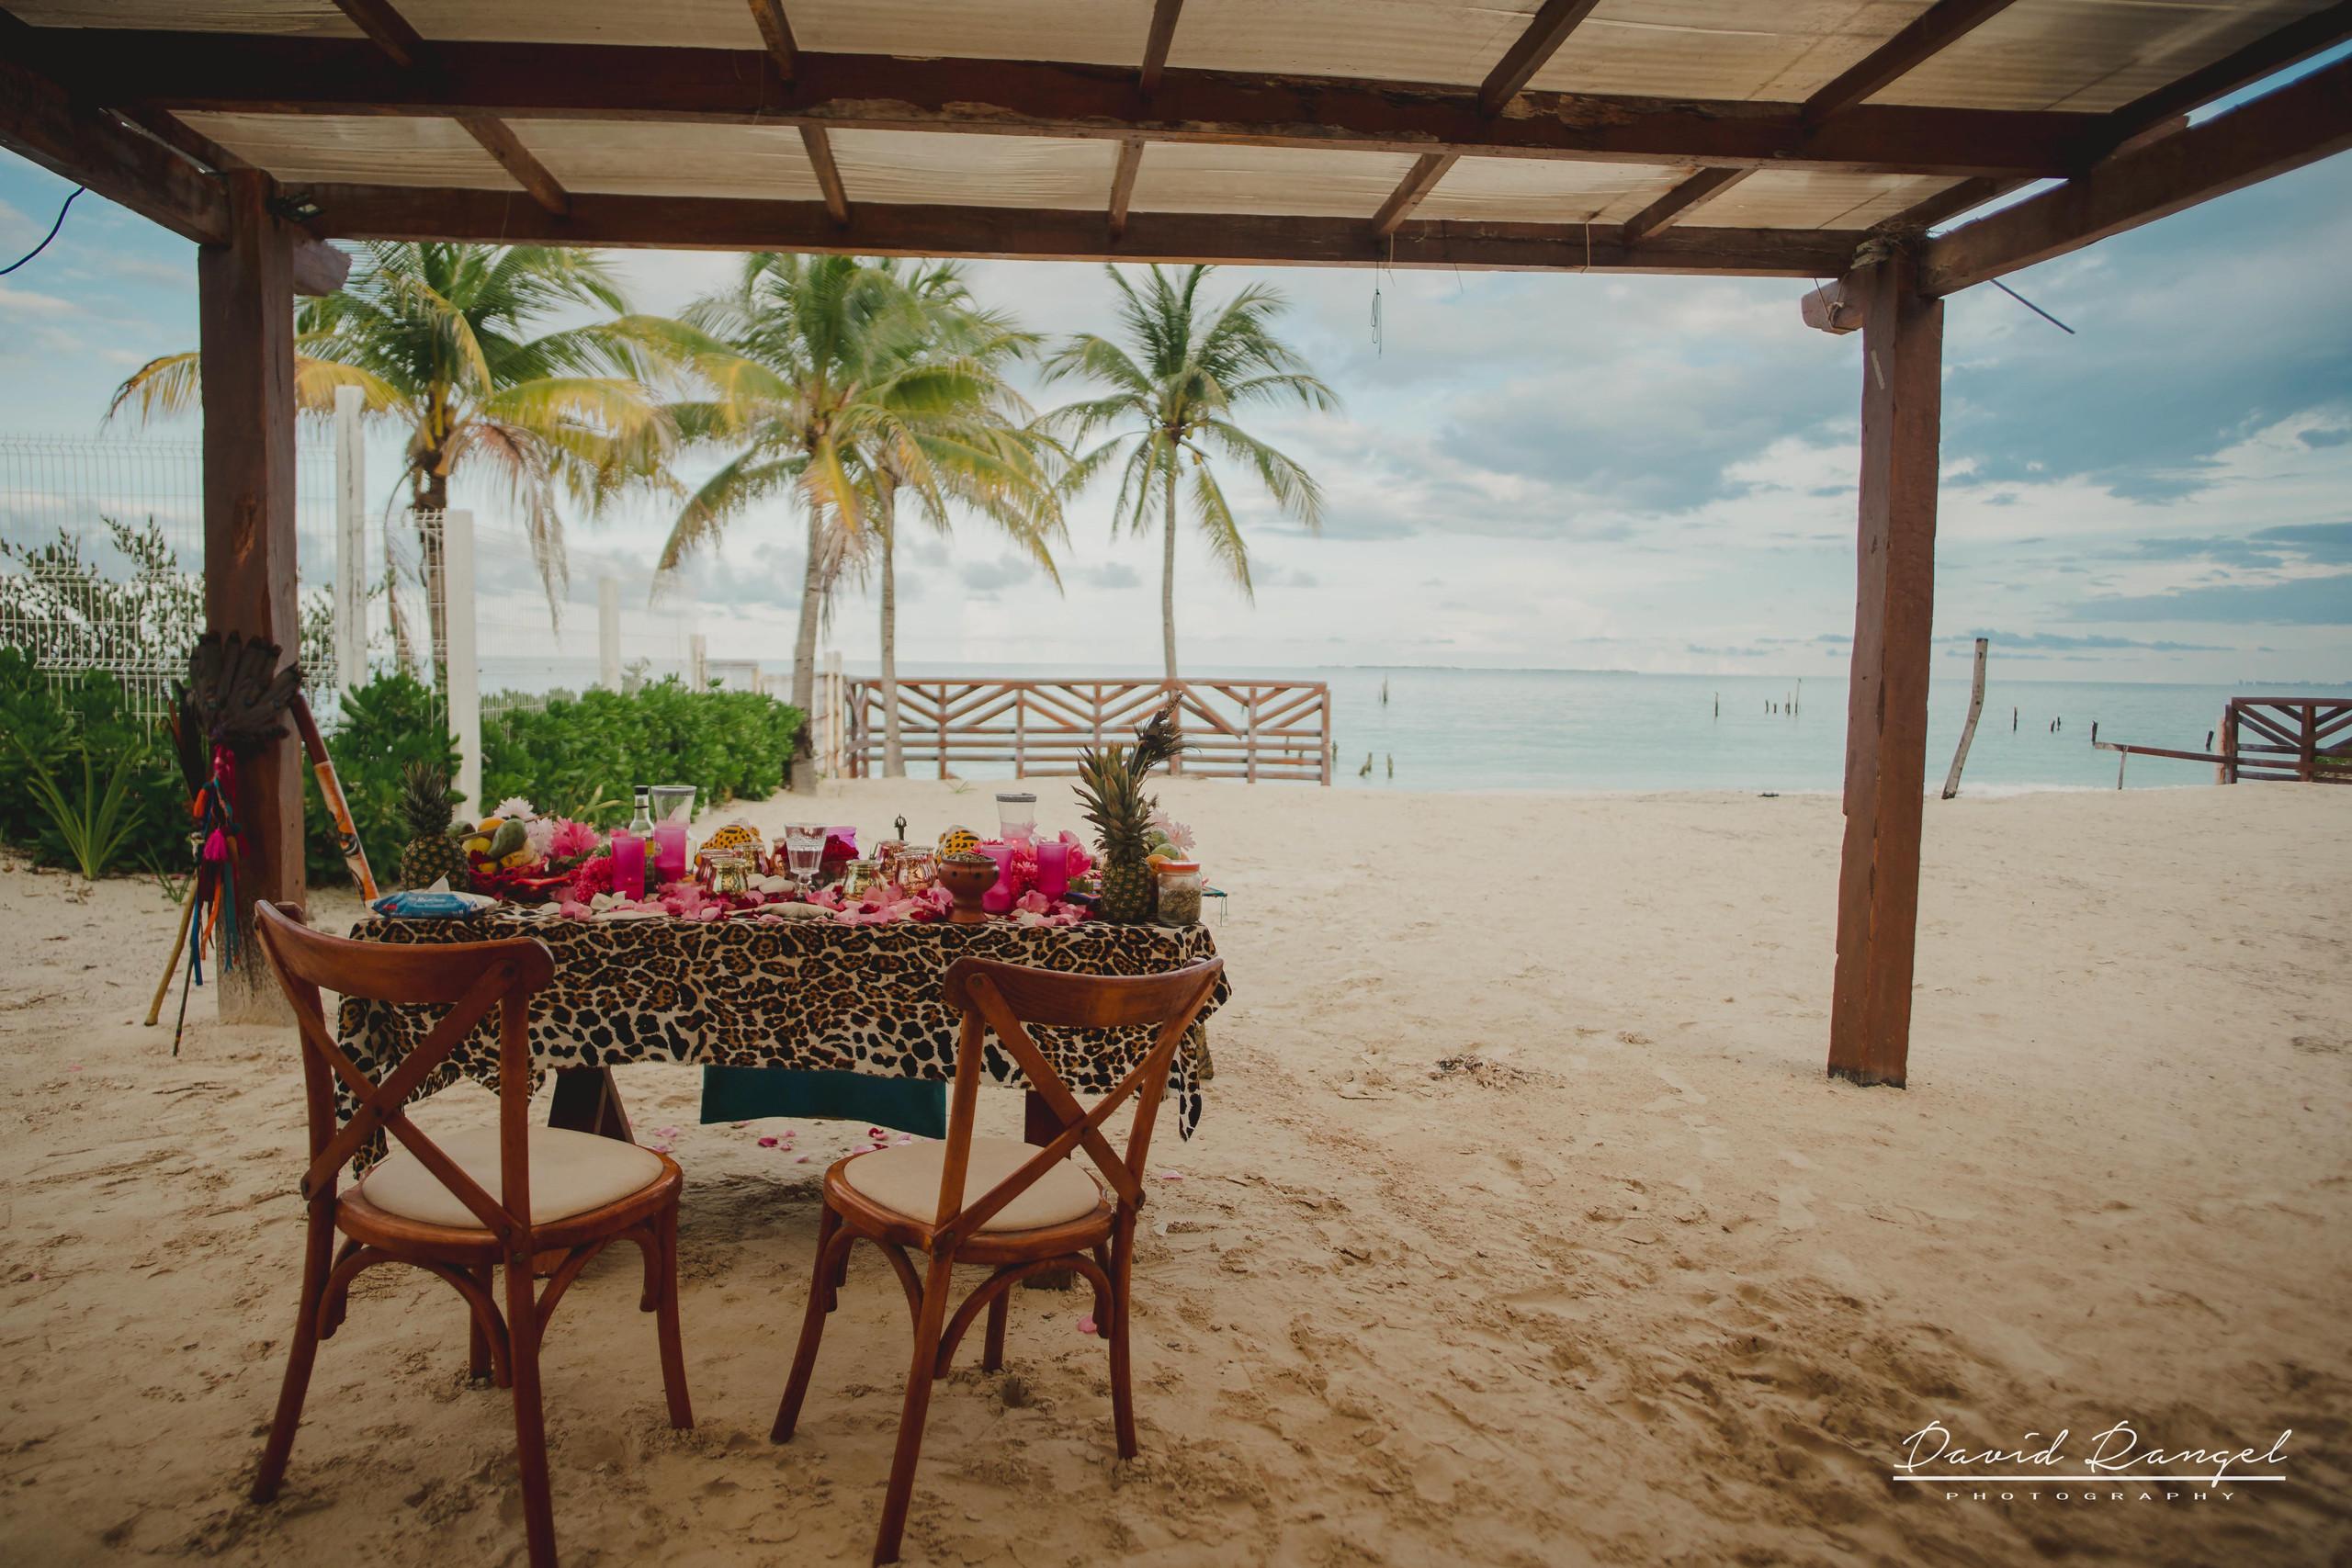 wedding+ceremony+gazebo+beach+traditional+mayan+sand